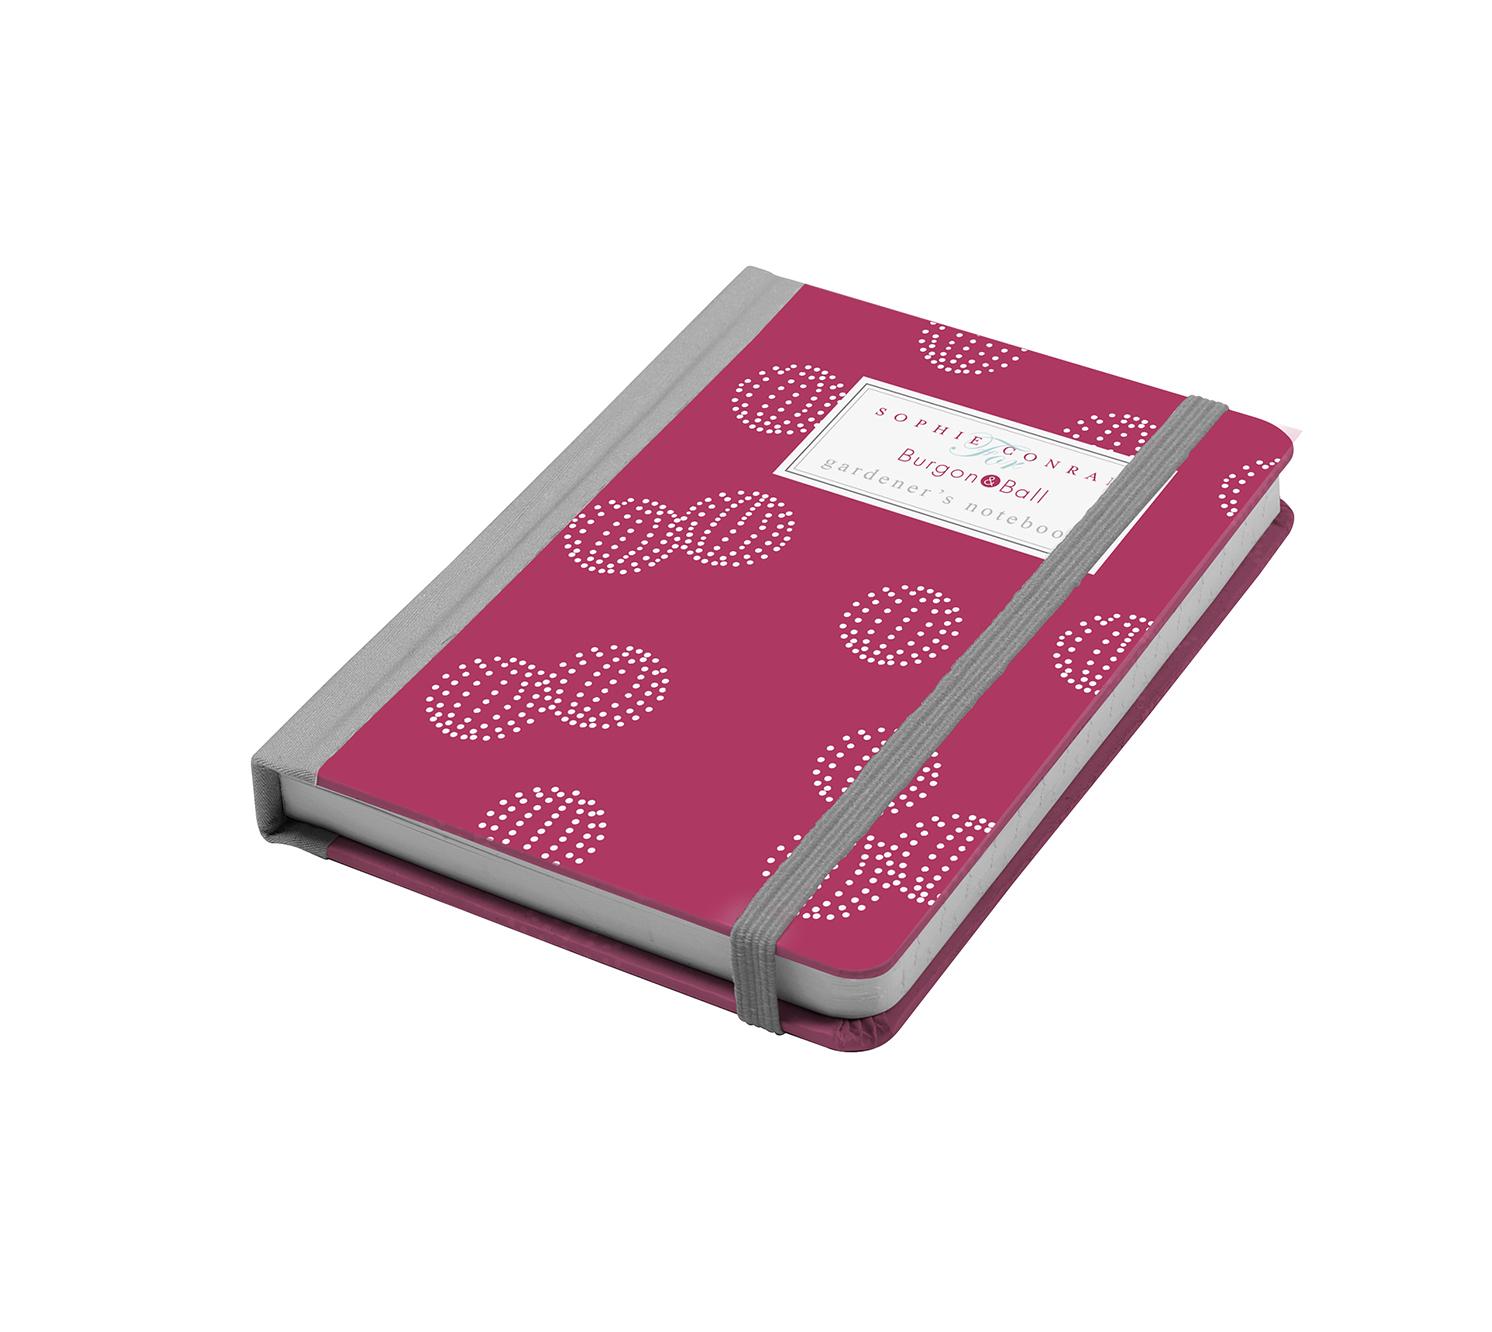 Burgon & Ball – Sophie Conran Gardener's A6 Notebook in Raspberry